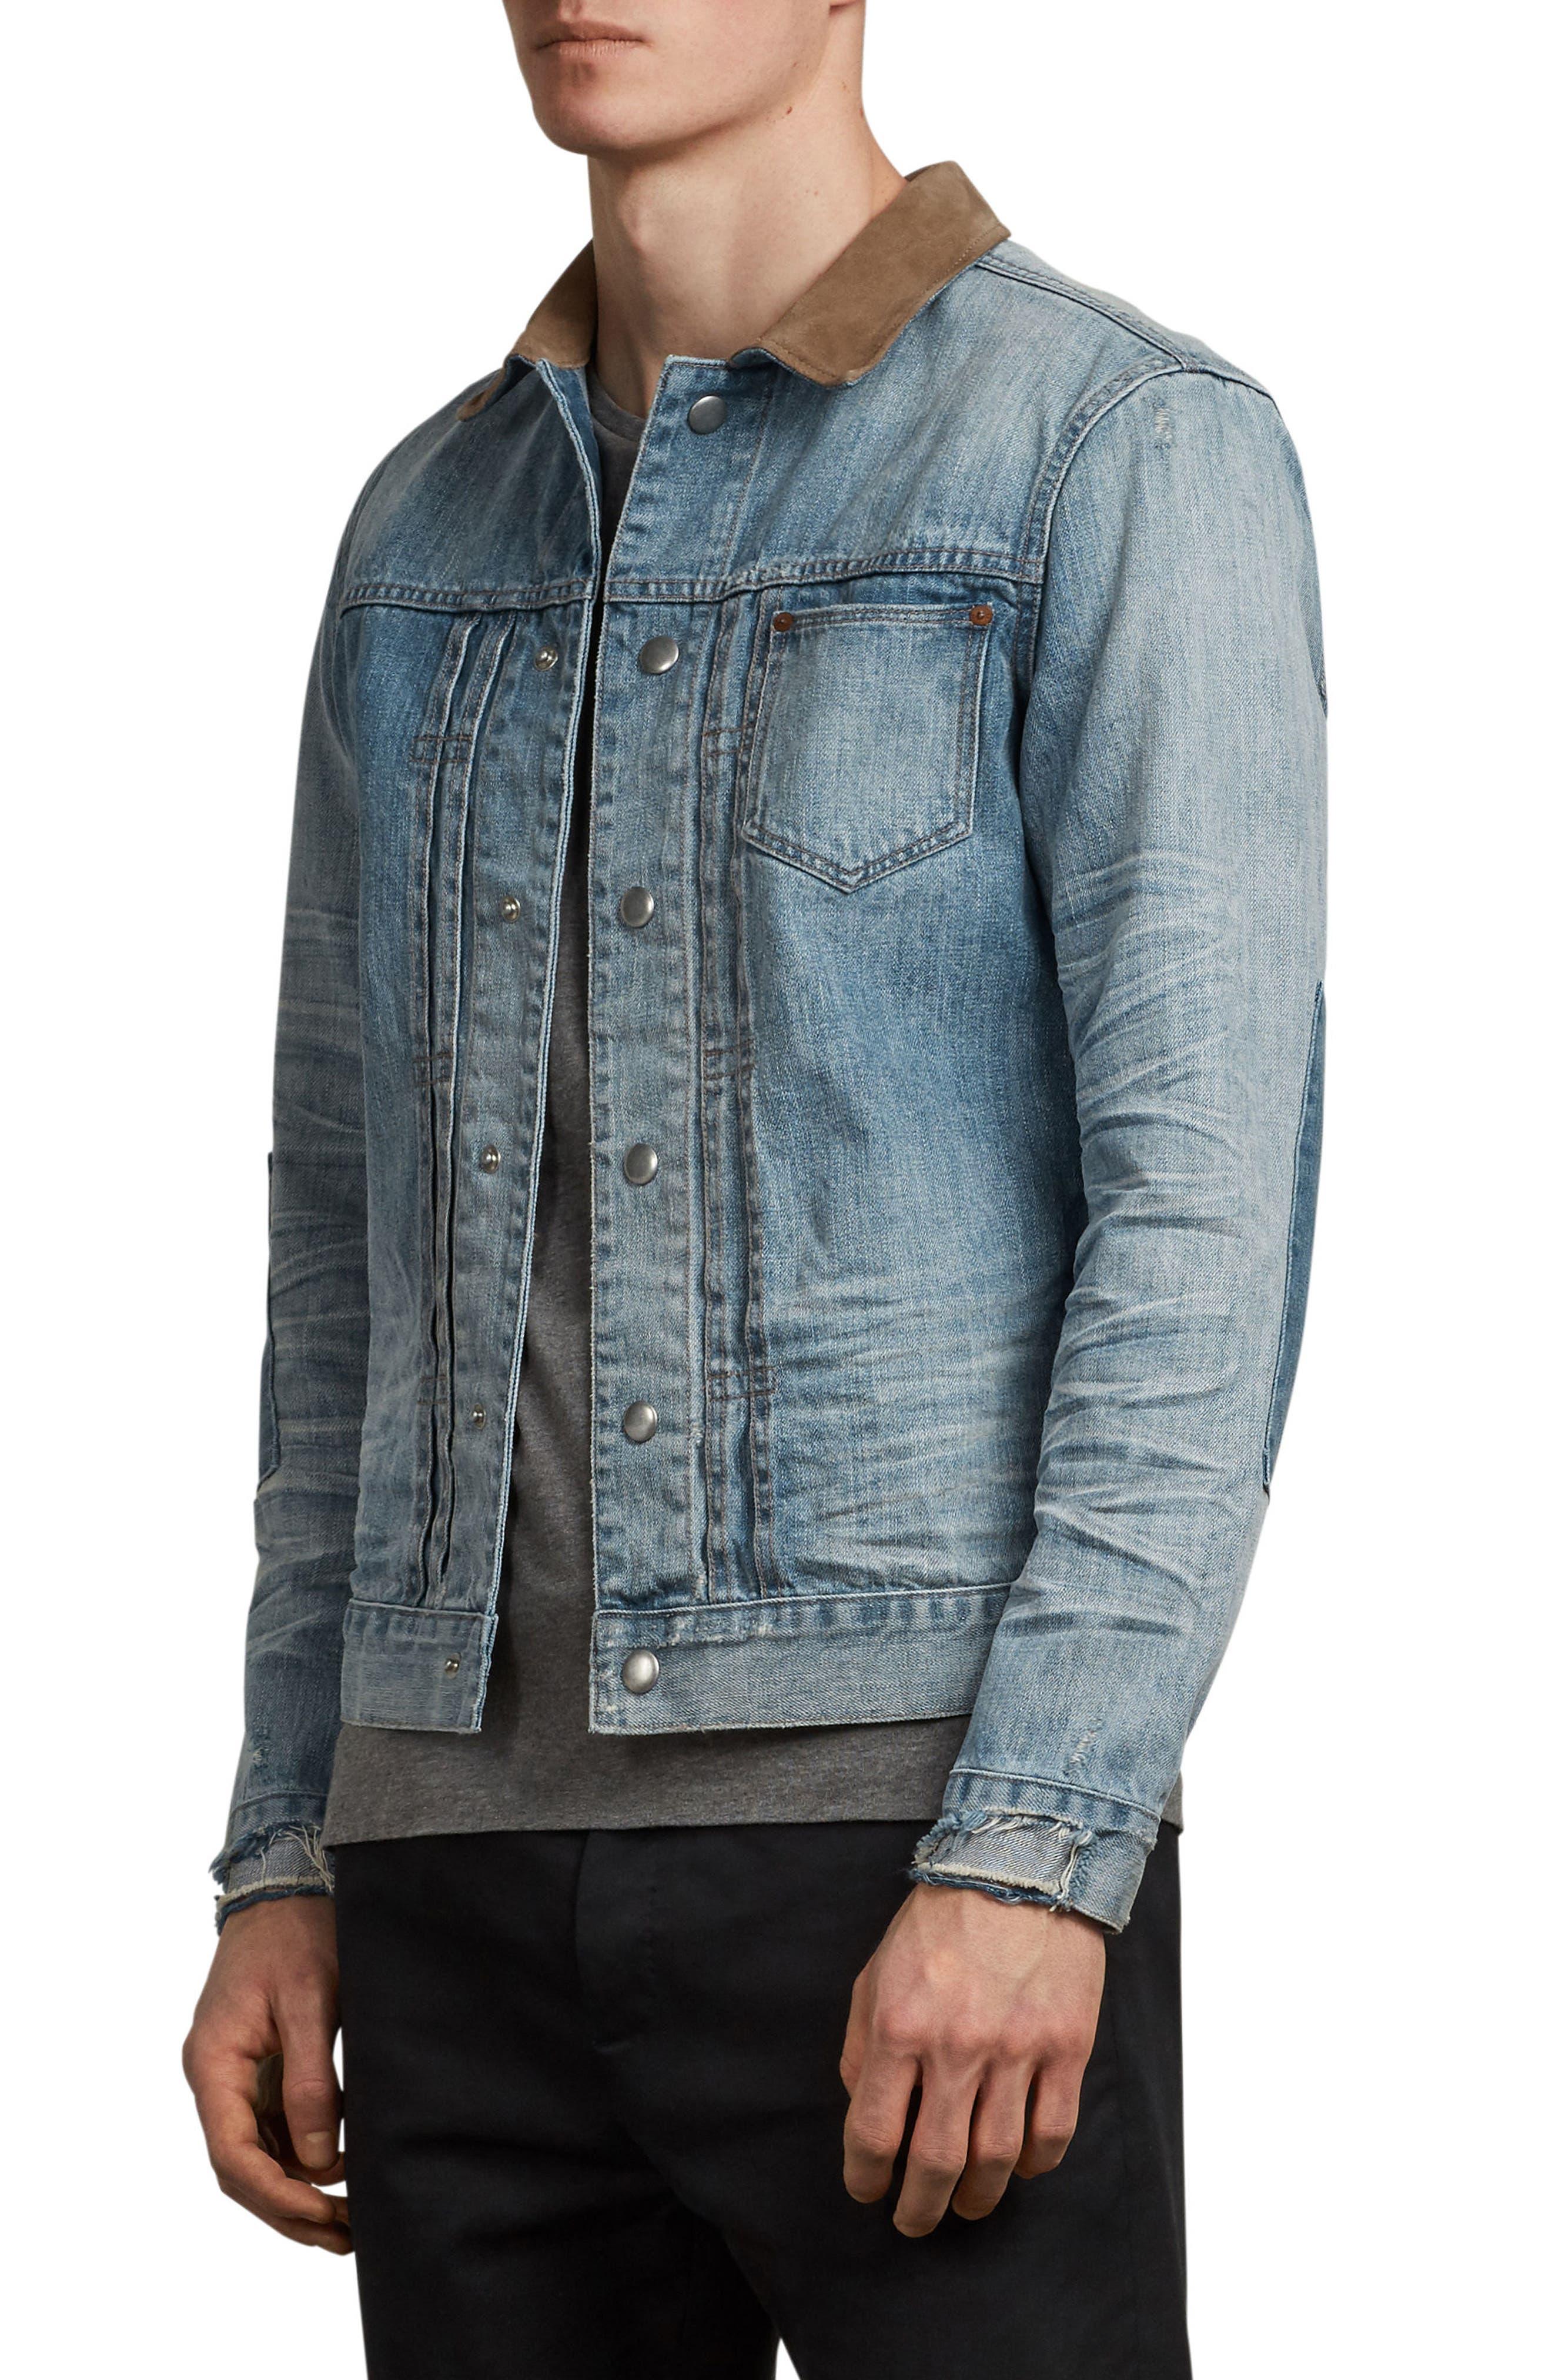 Ibanex Slim Fit Distressed Denim Jacket,                             Alternate thumbnail 3, color,                             Indigo